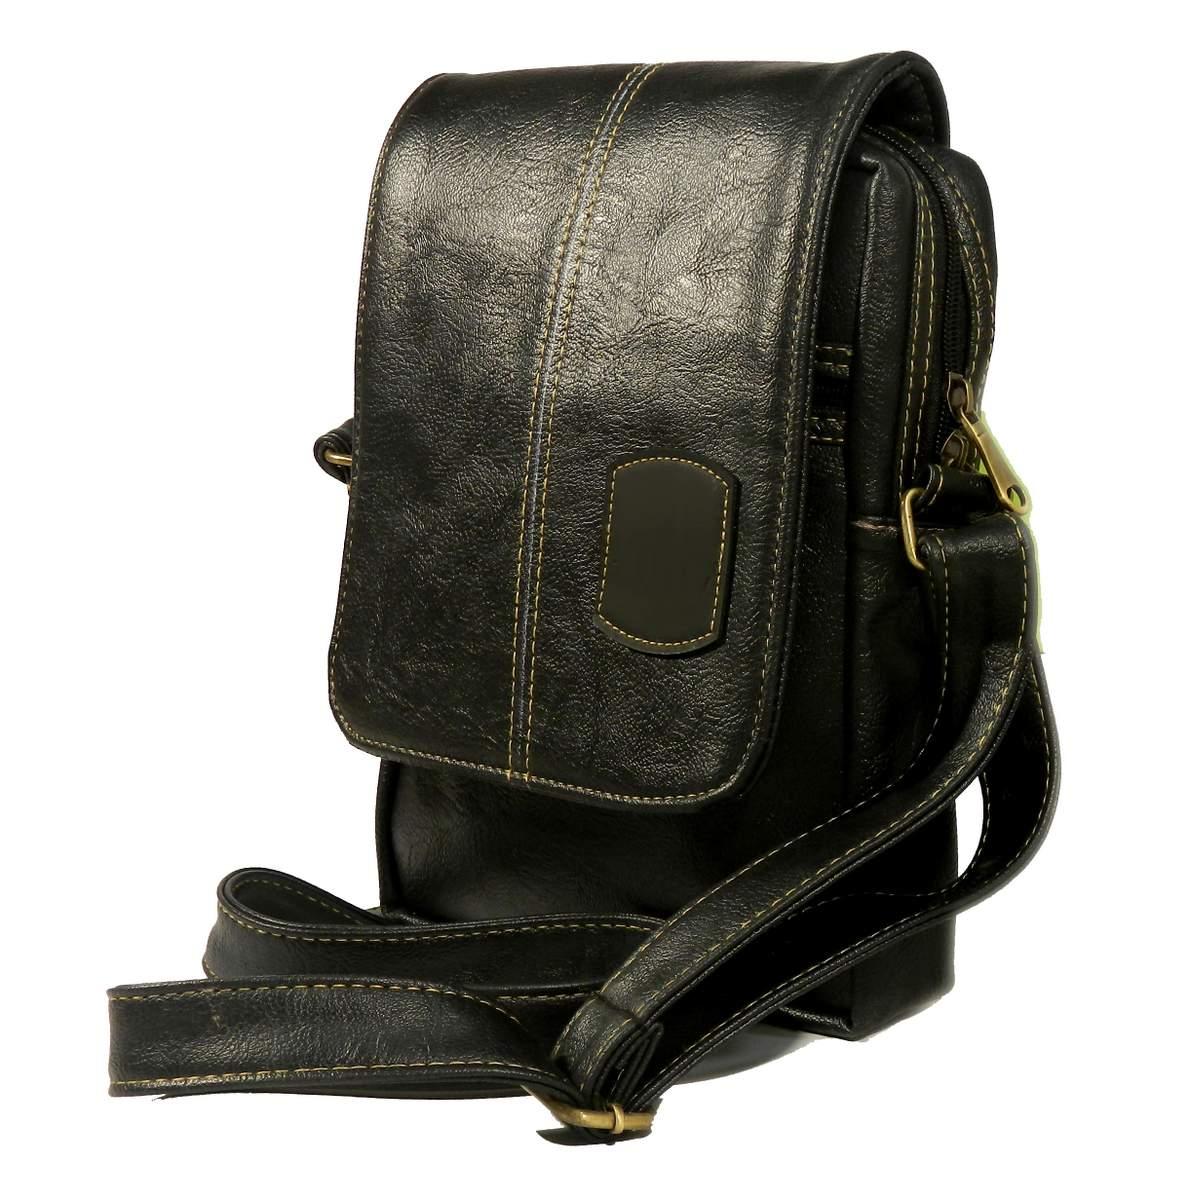 ed9df72325d Brogues Oxford Black Leather Messenger Bag-Sunrise Trading Co.